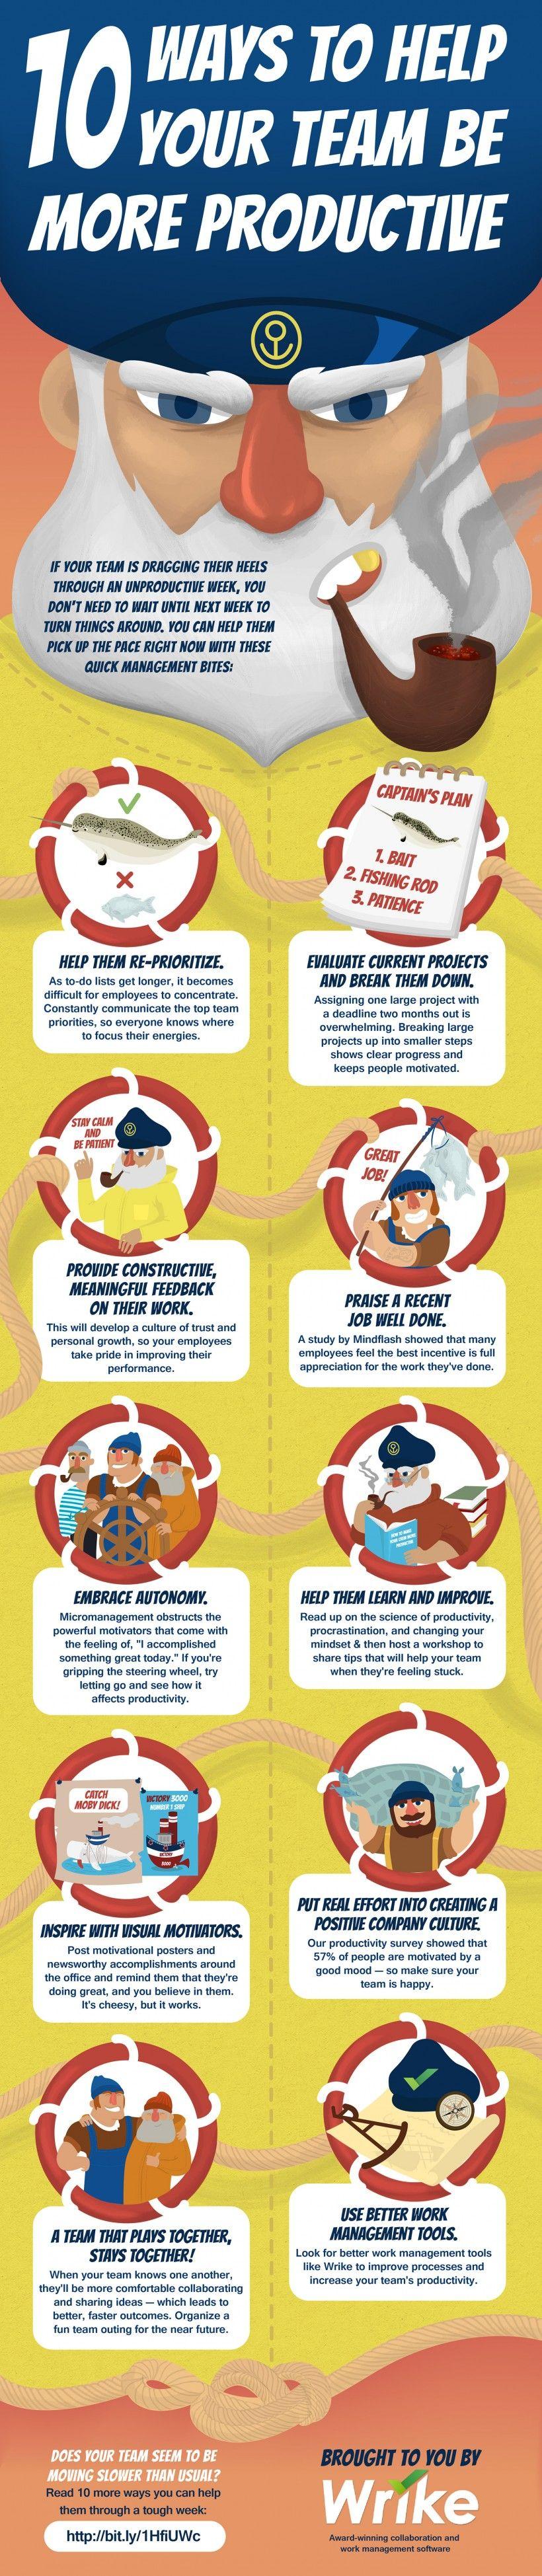 Team Productivity Infographic